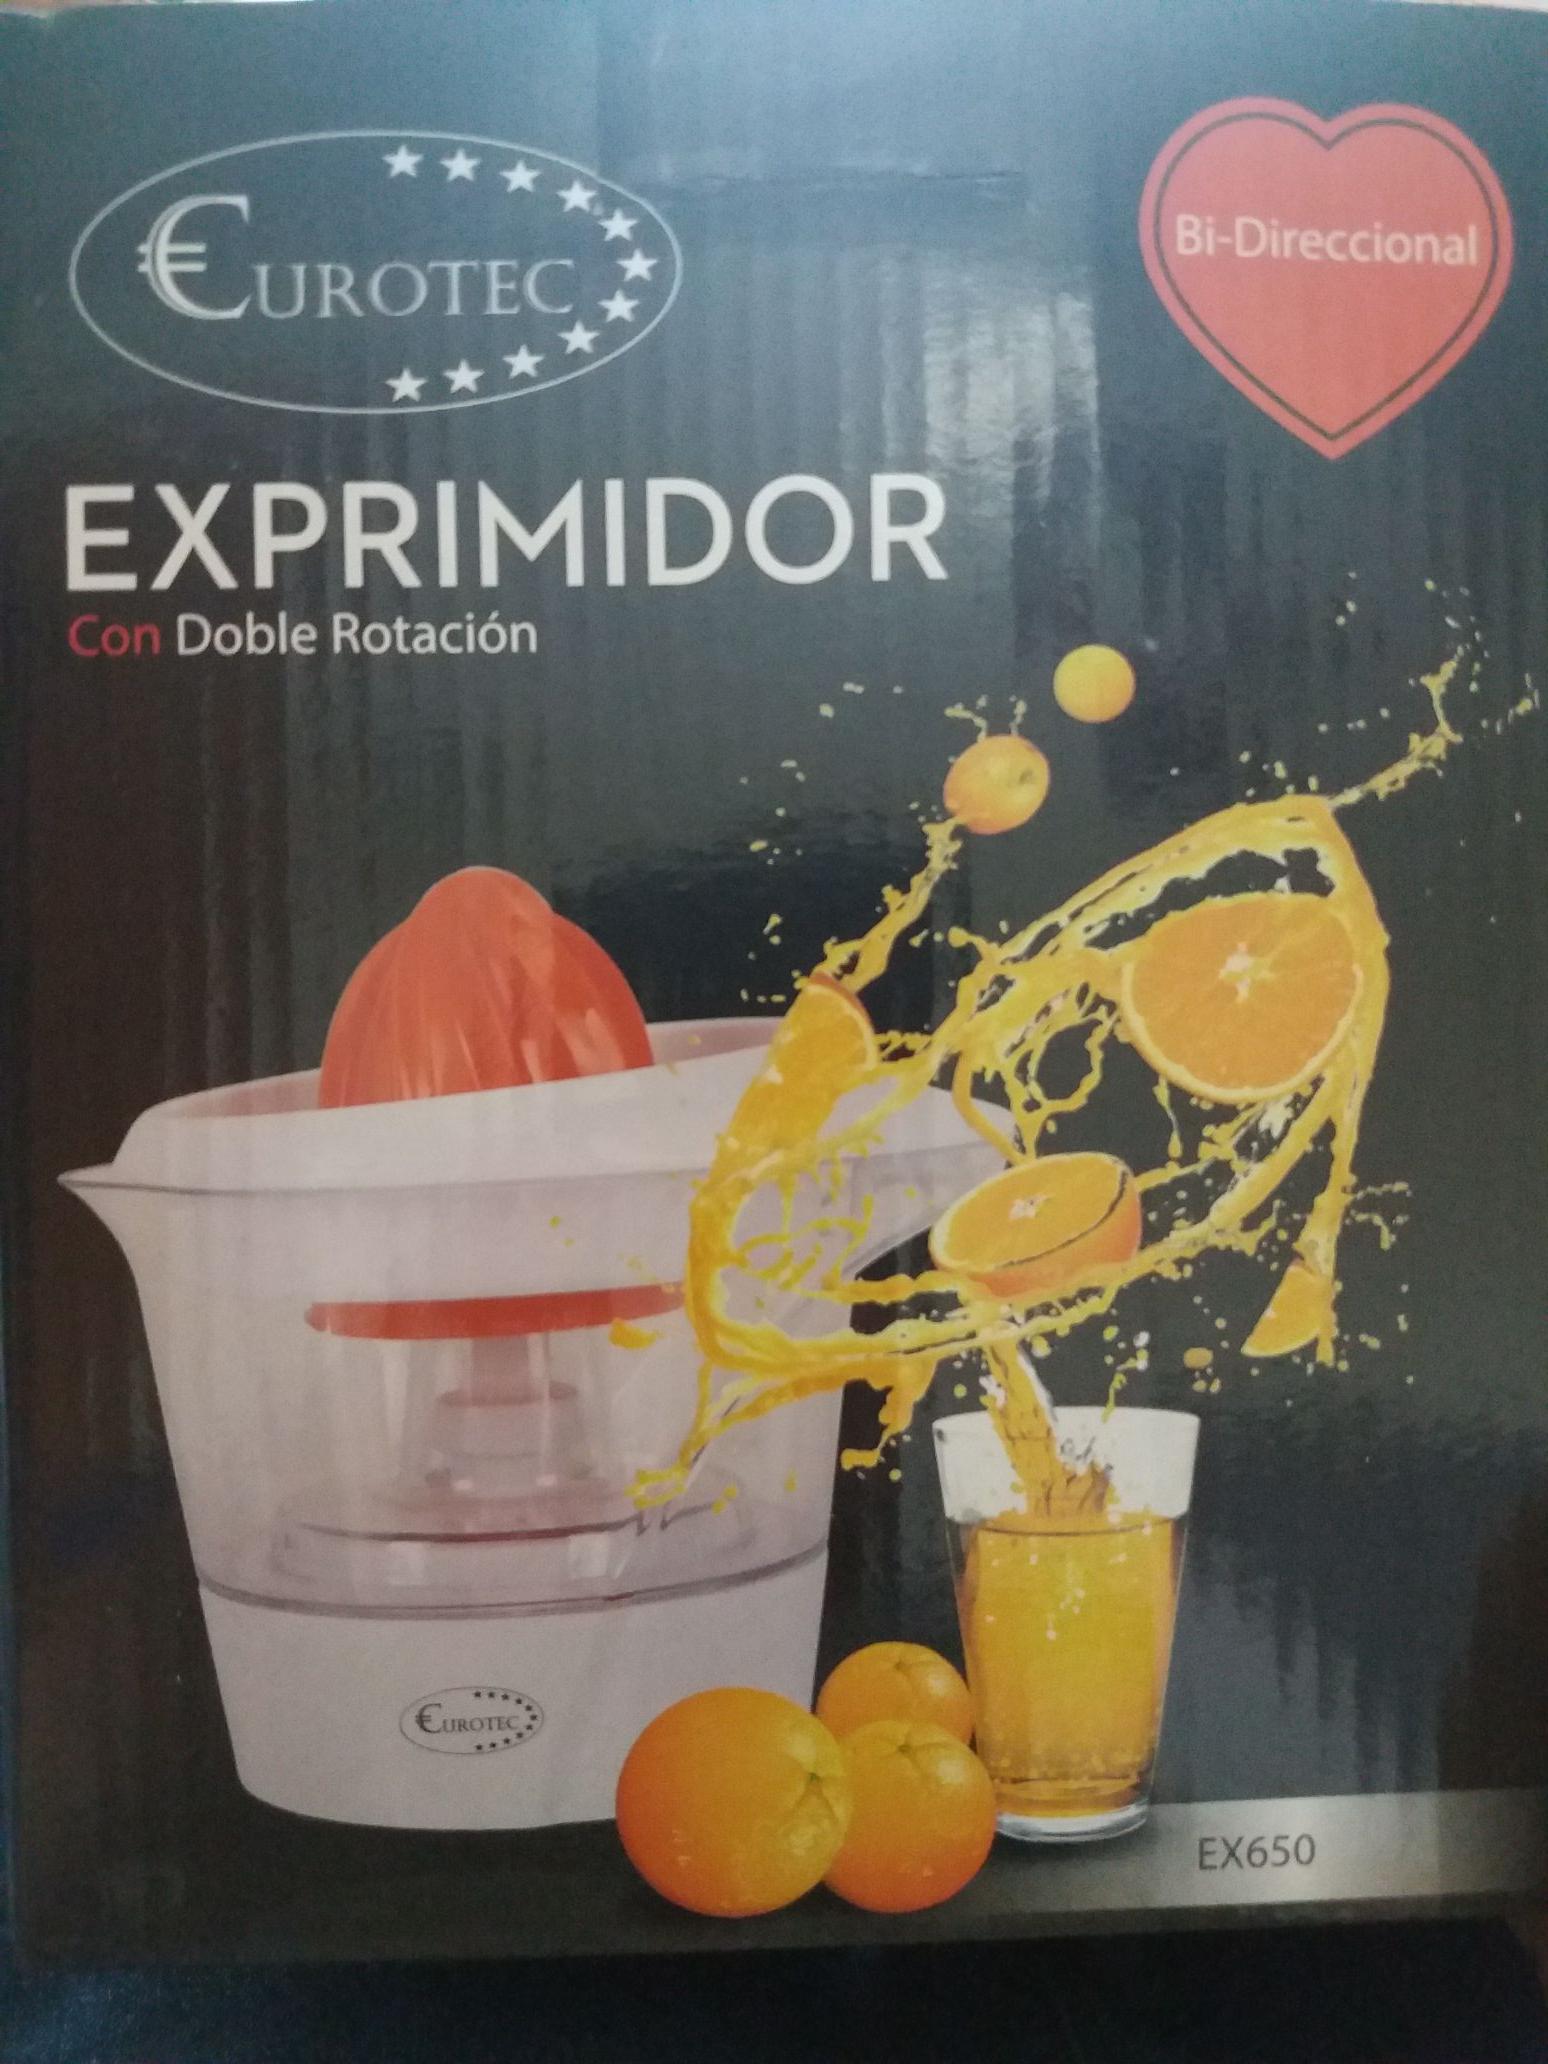 Exprimidor eléctrico 6€ en Carrefour (+3€ en Cheque)